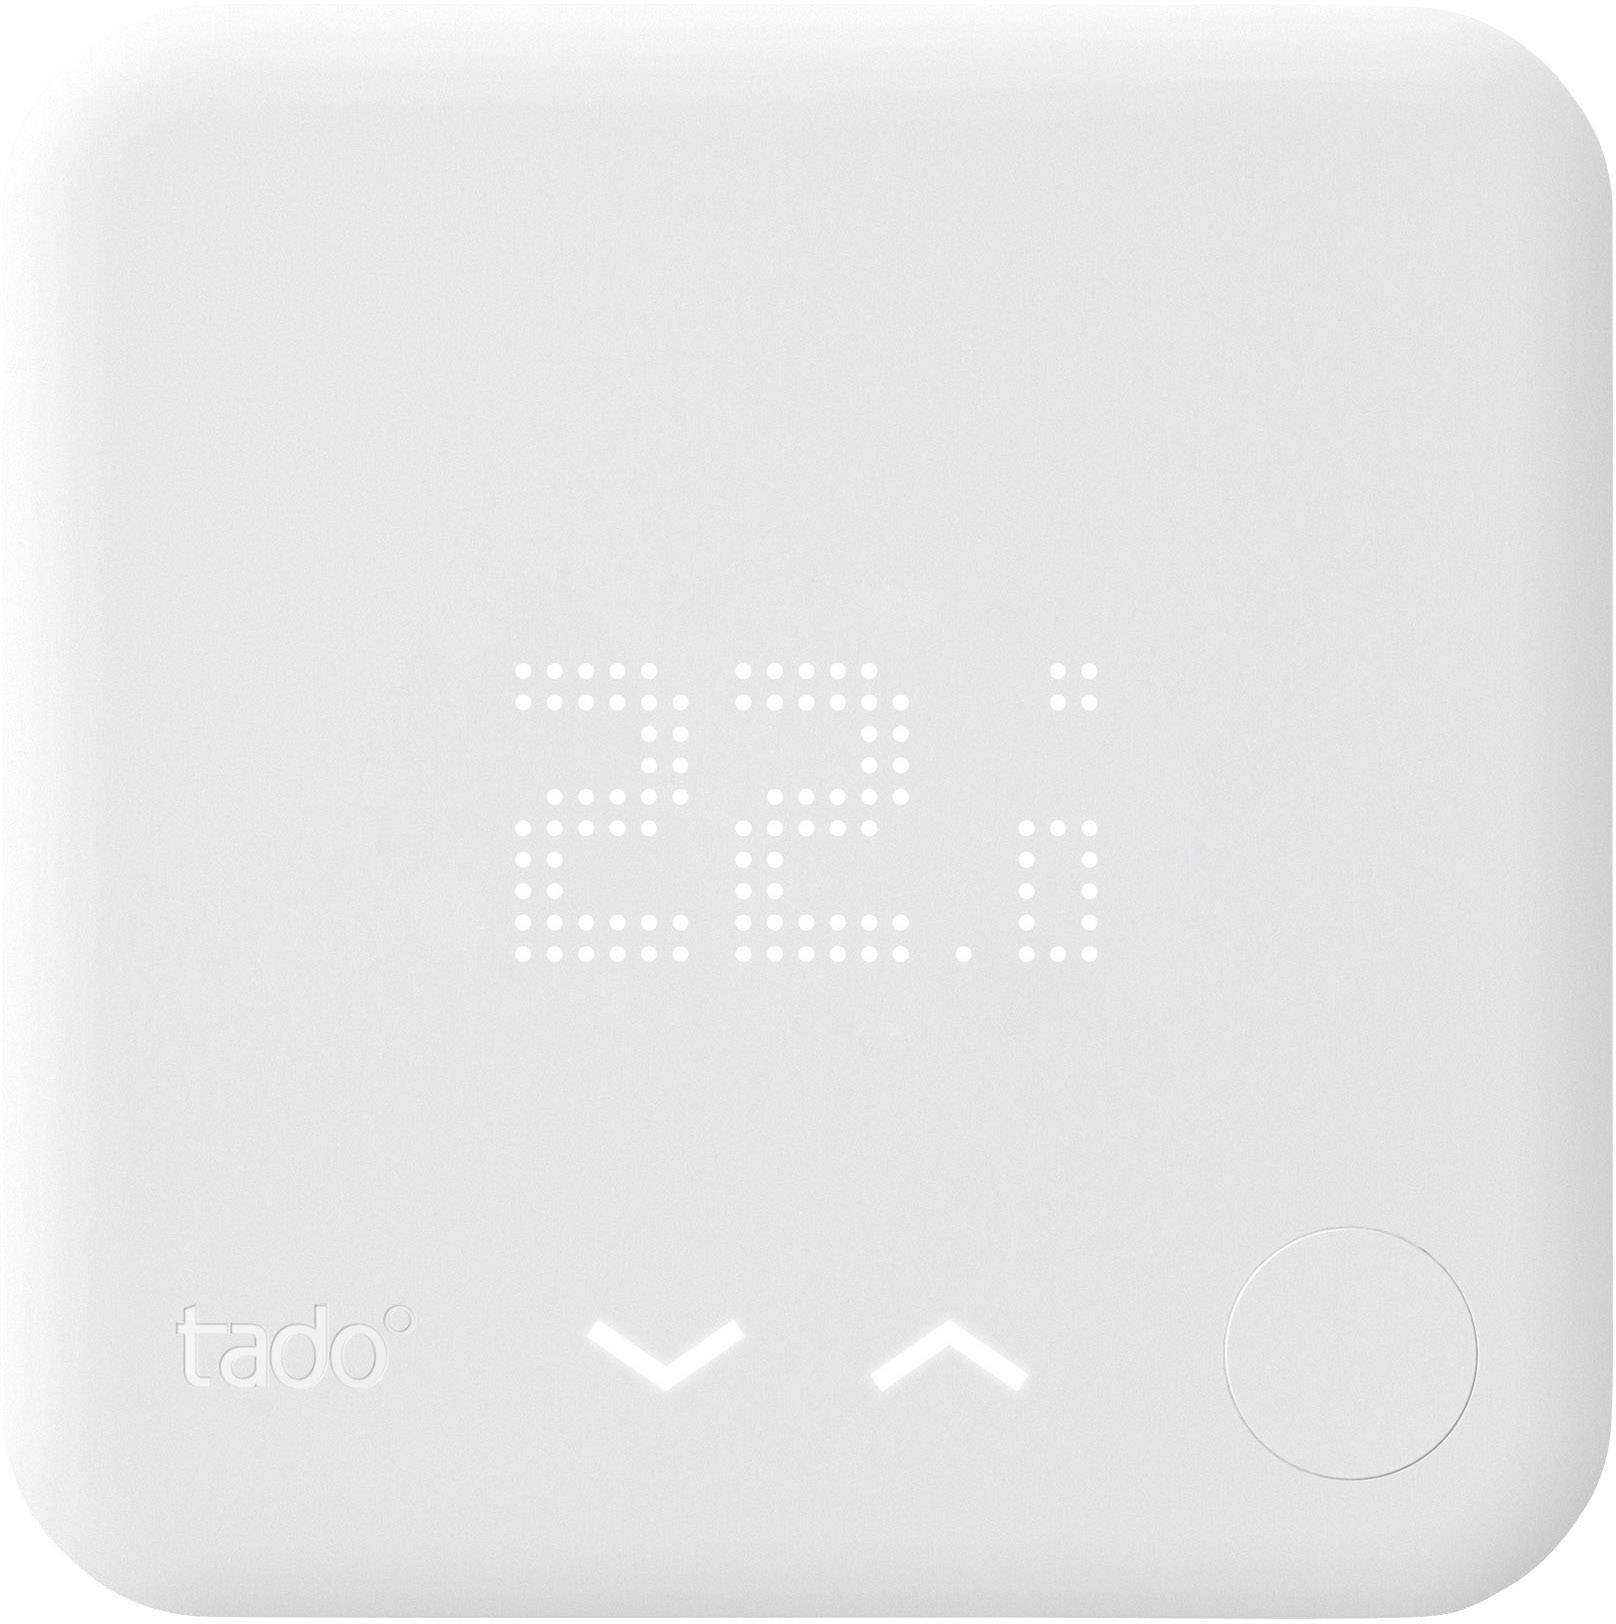 Bezdrátový pokojový termostat tado° s dotykovým ovládacím panelem